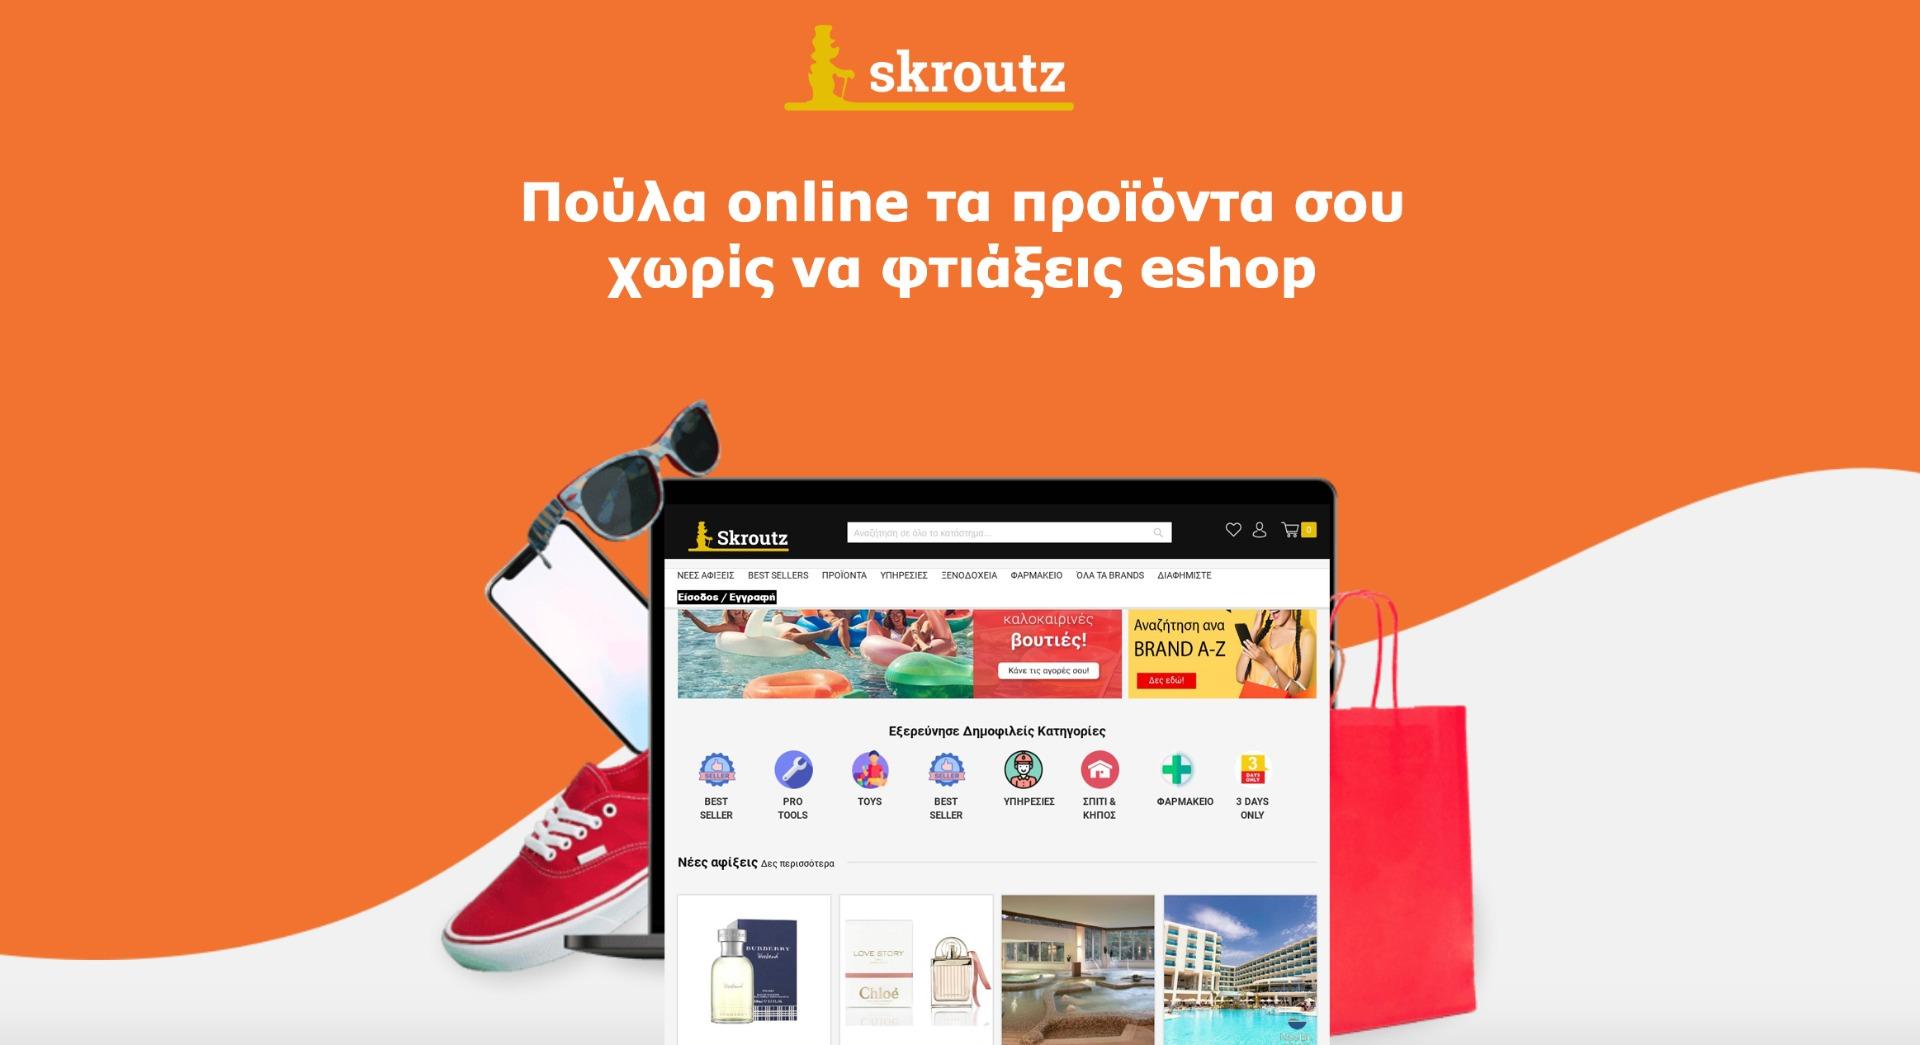 Skroutz® Κύπρου - Skroutz.com.cy